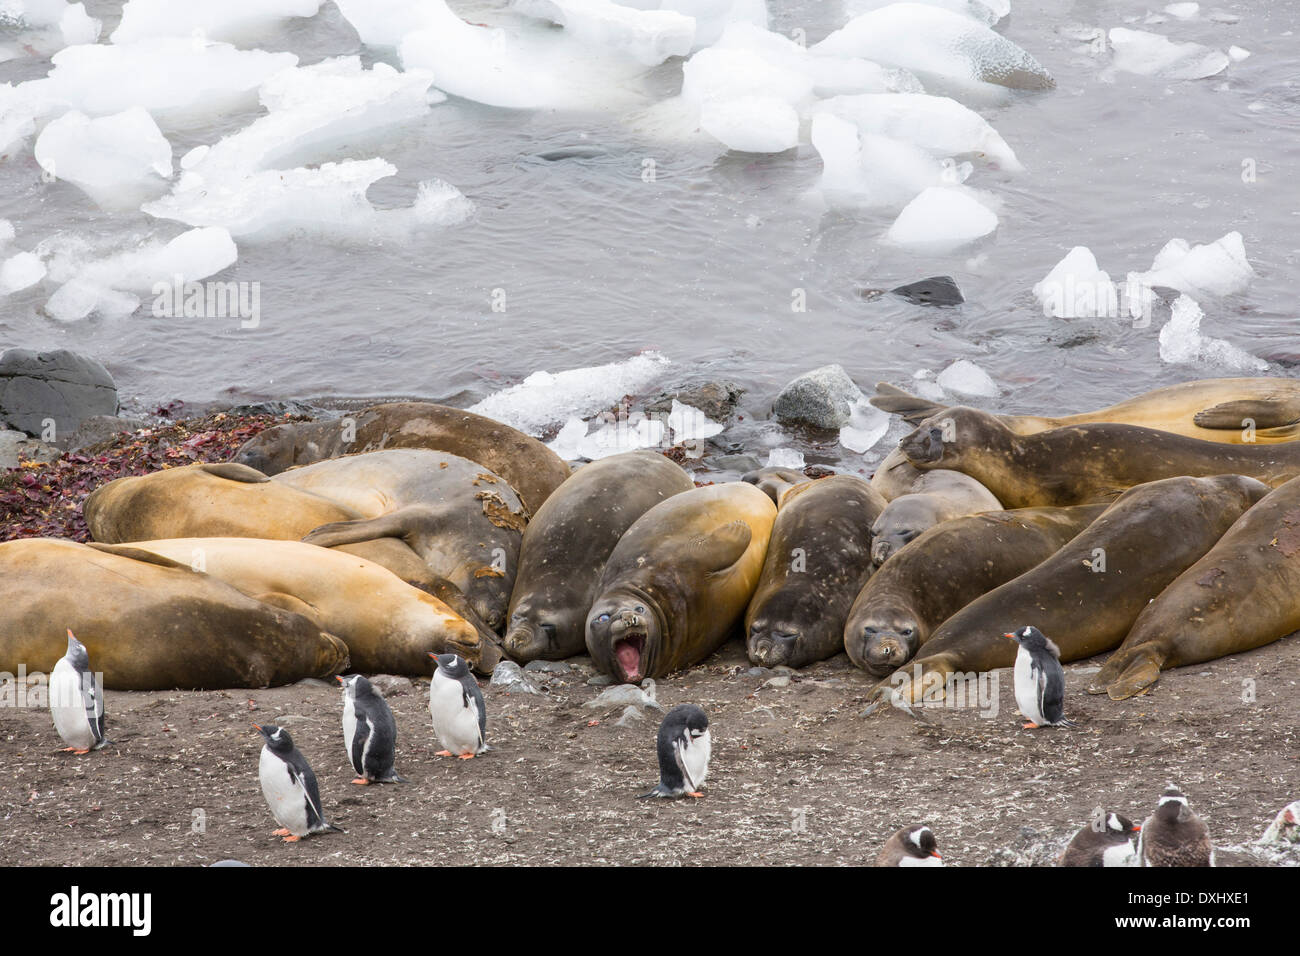 Southern Elephant Seals; Mirounga leonina, with Gentoo Penguins at Hannah Point, on Livingston Island - Stock Image